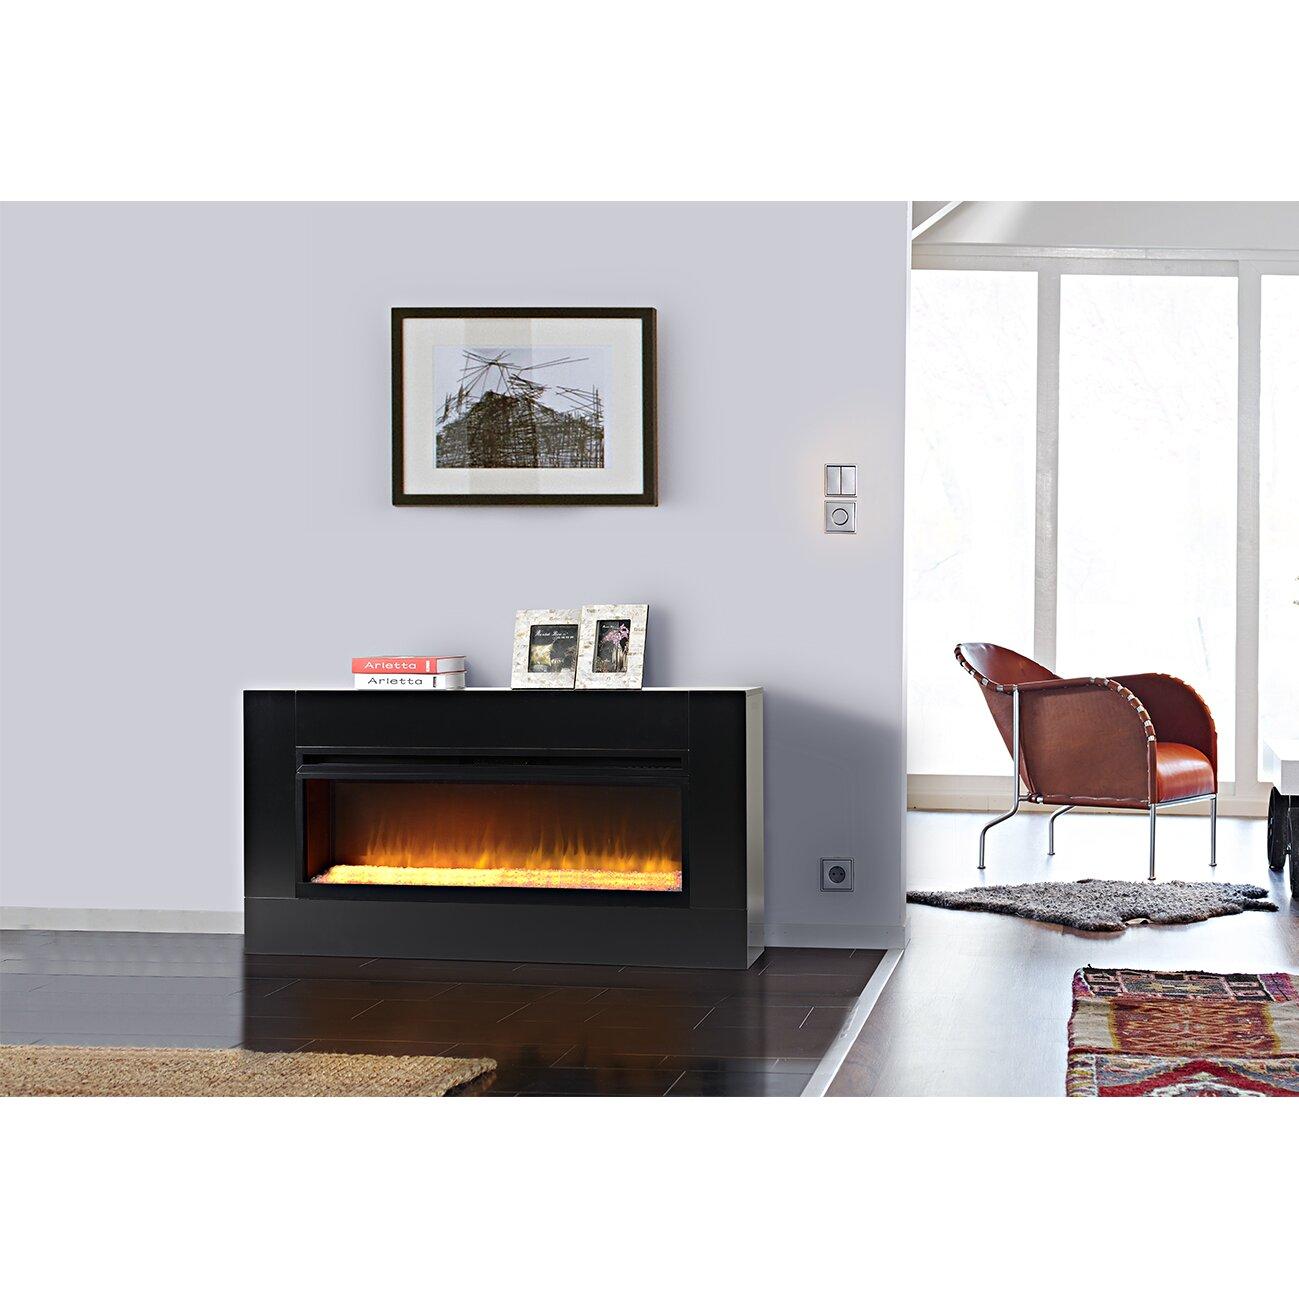 Homestar Mantova Freestanding Electric Fireplace - Homestar Mantova Freestanding Electric Fireplace & Reviews Wayfair